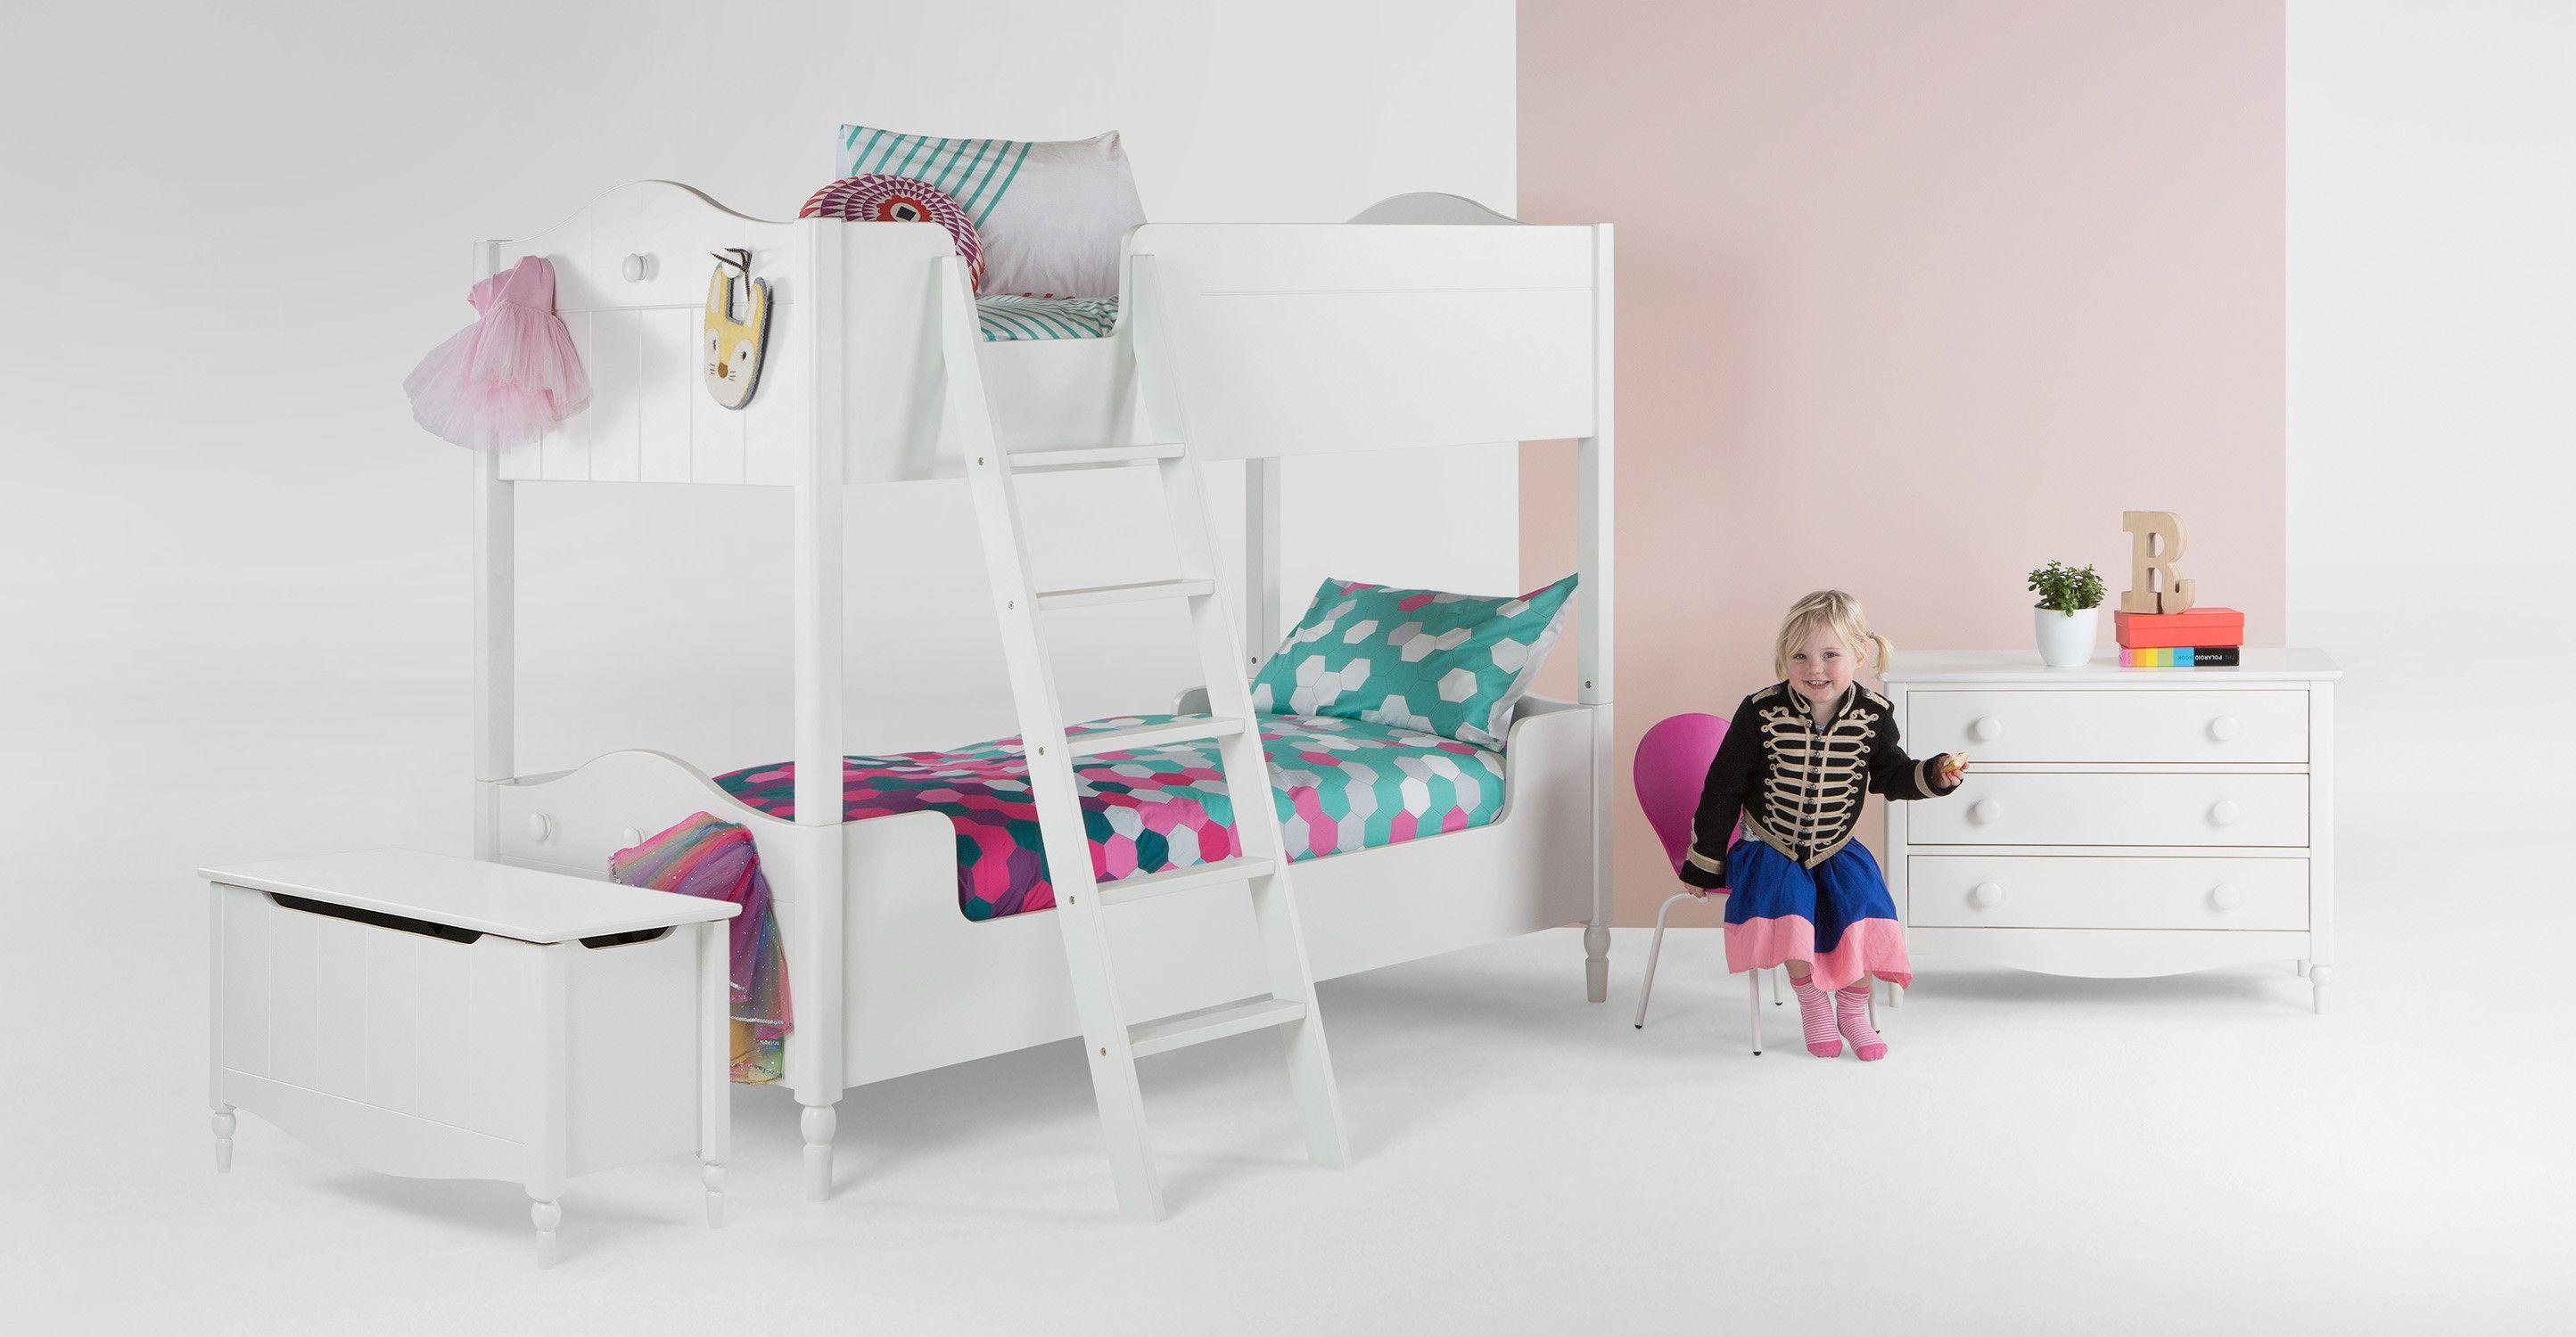 Etagenbett Holz Berlin : Cara etagenbett für kinder weiß